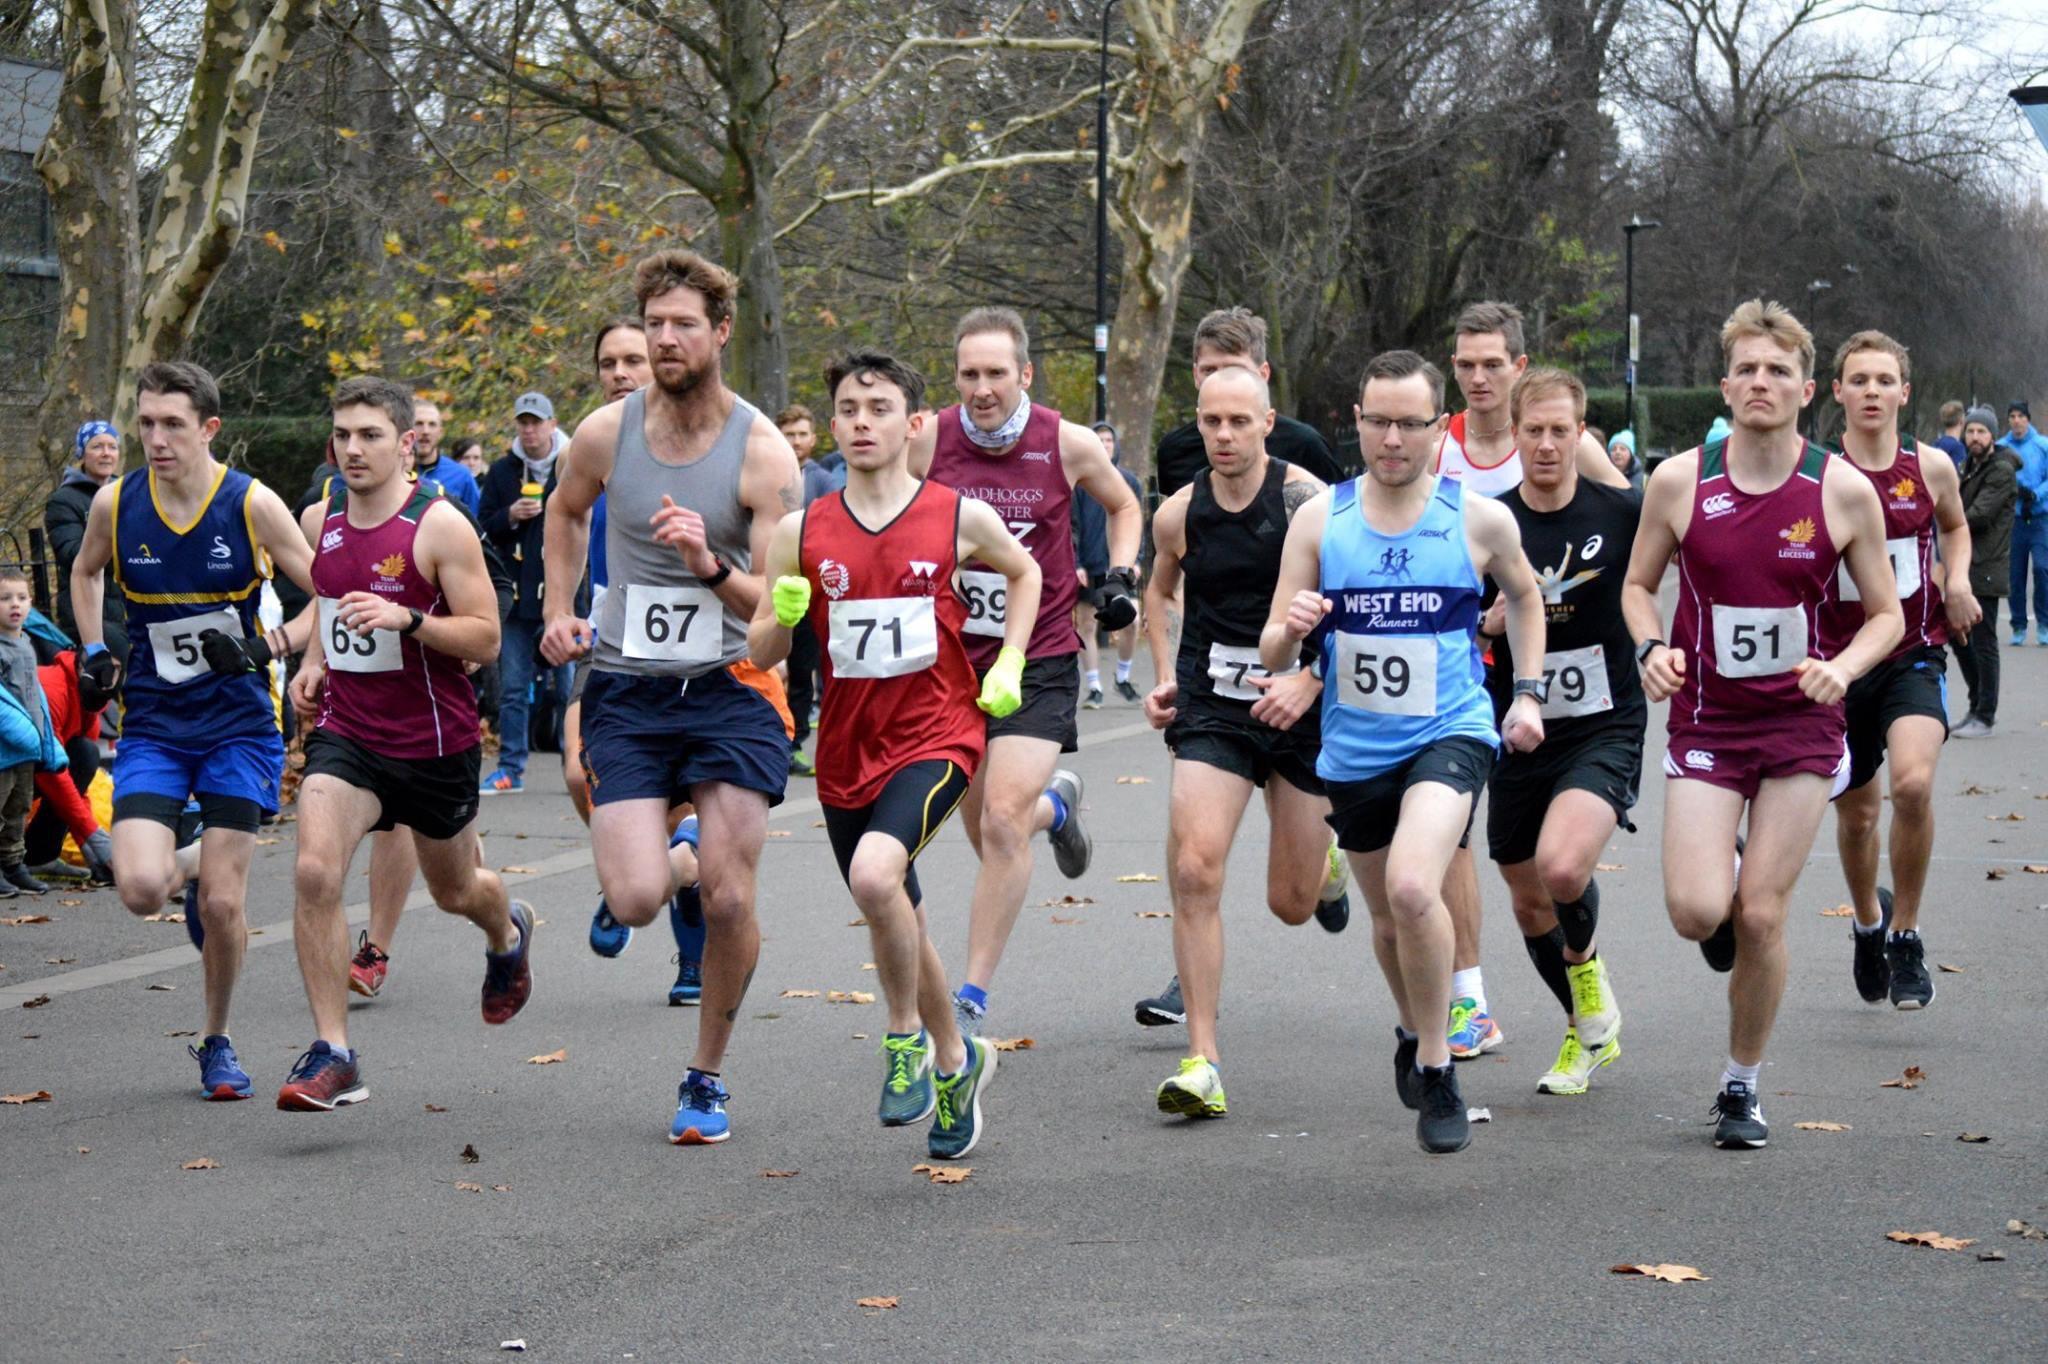 The 2018 Men's race setting off